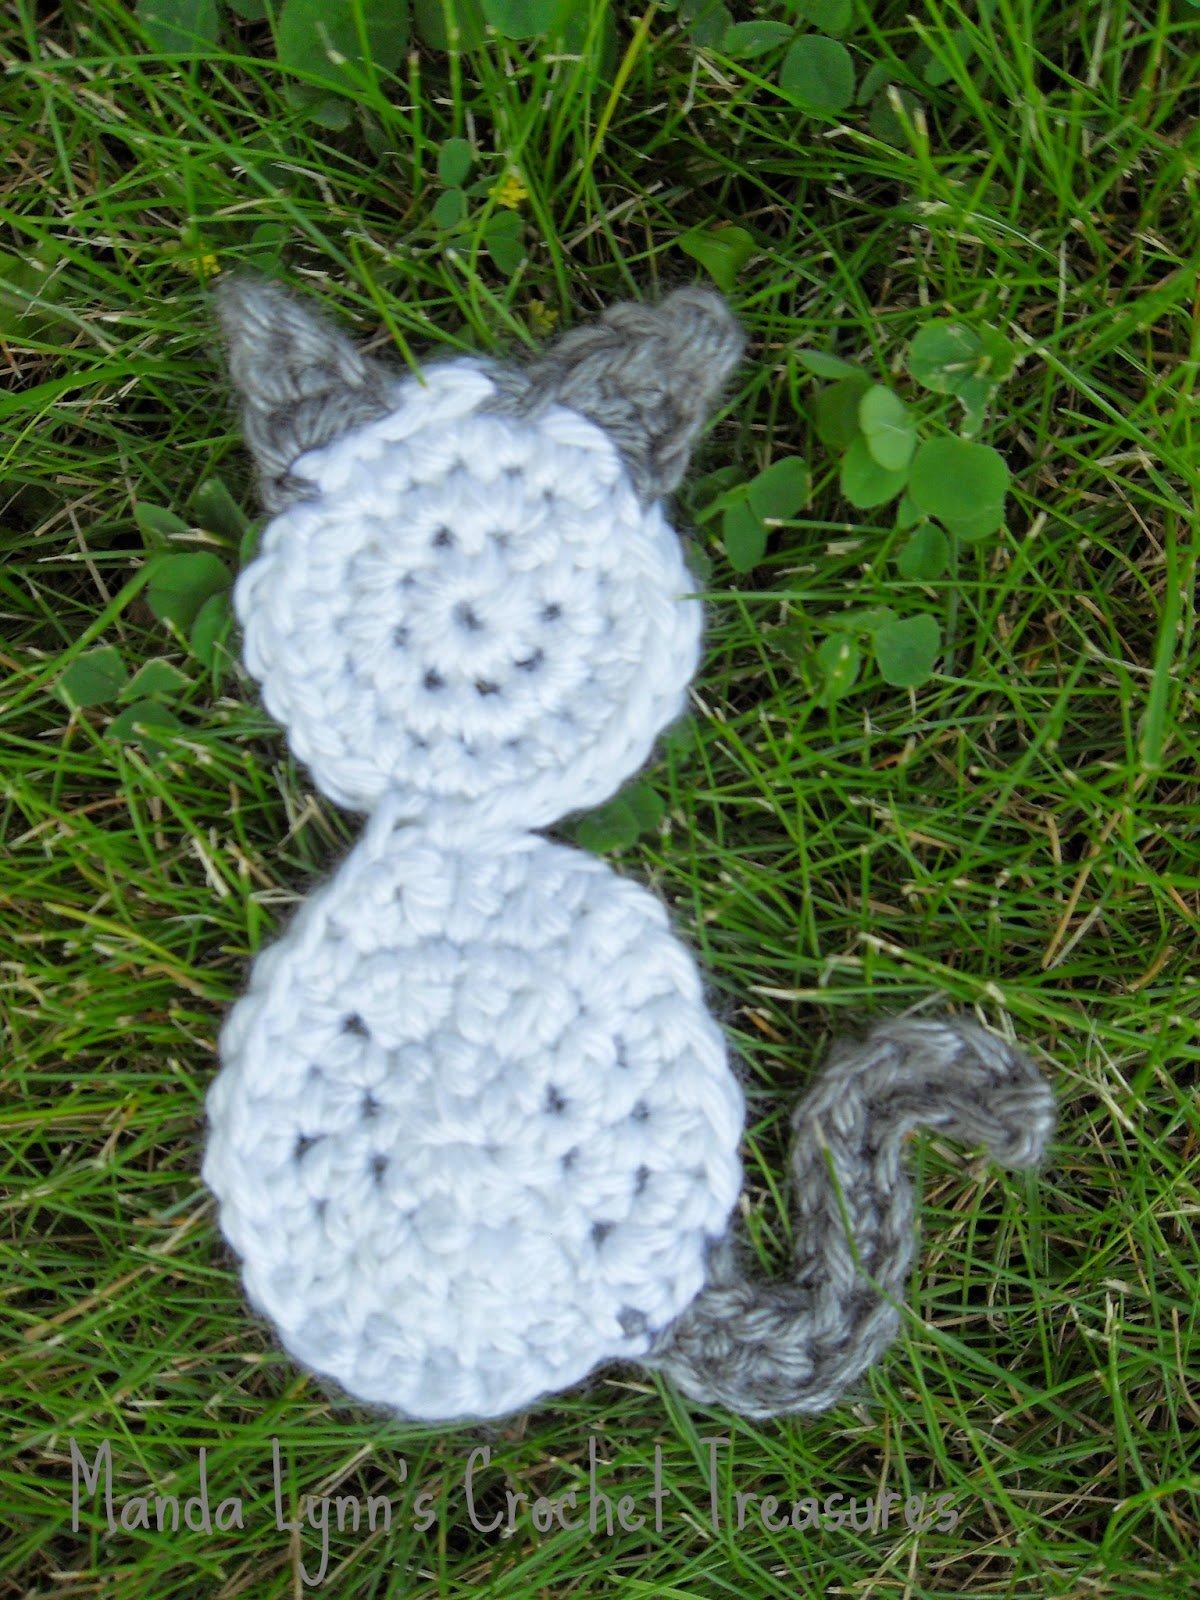 Aizen the Kitty Applique ~ Manda Proell - MandaLynn's Crochet Treasures